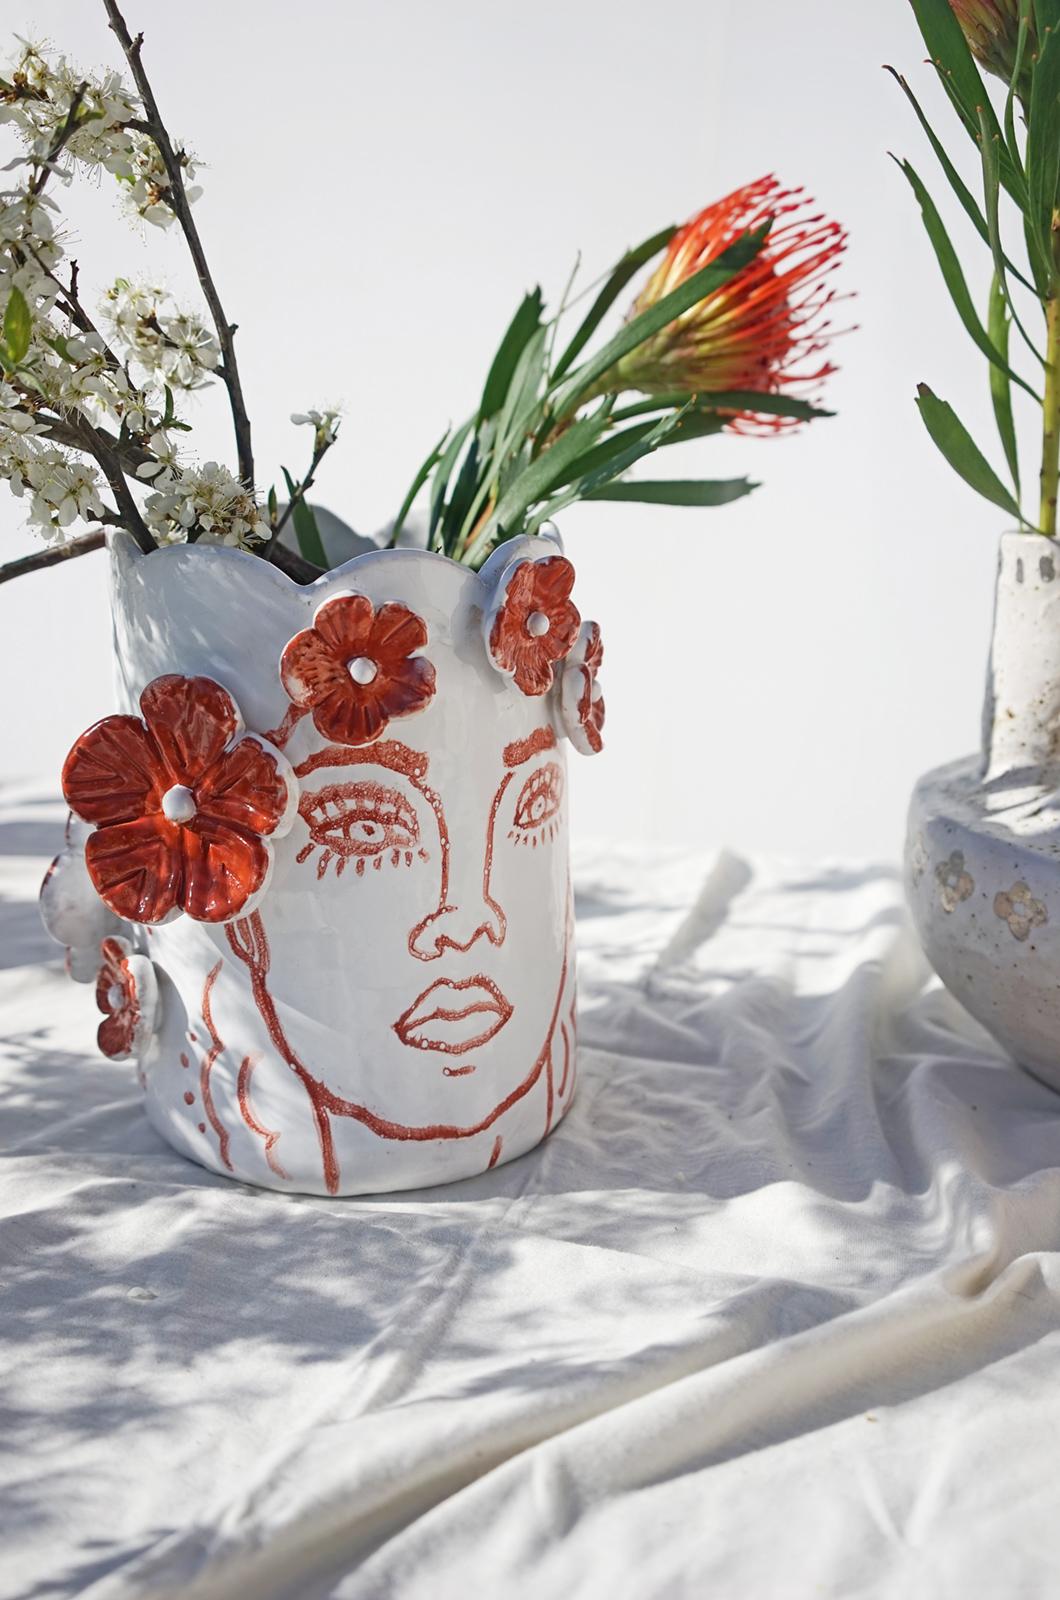 alagonda-grote-vaas-met-bloemen